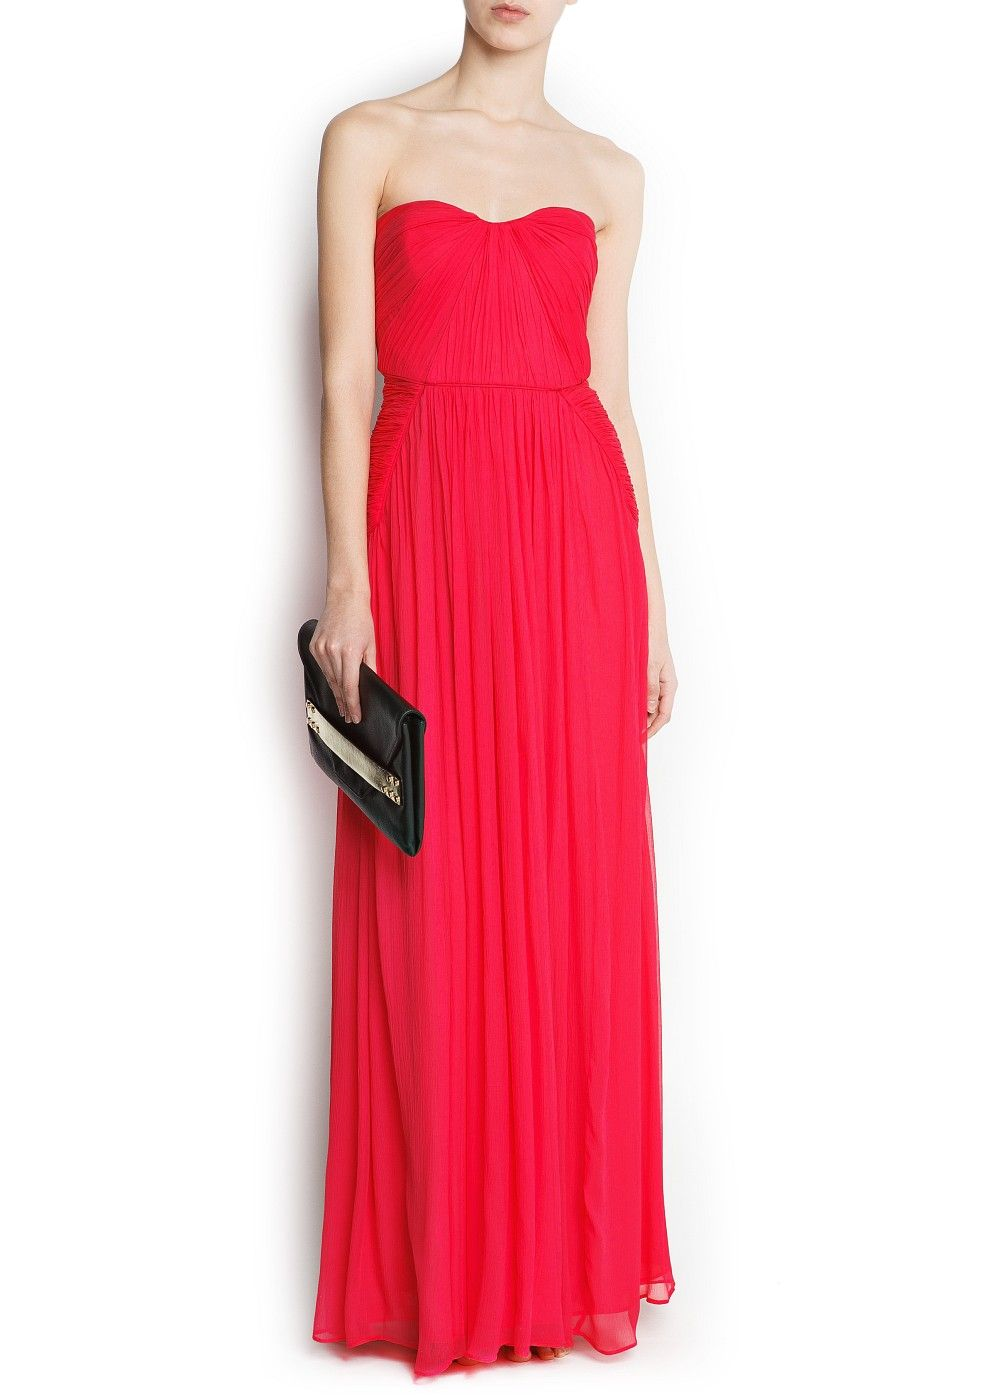 Robe longue soie - Femme   Robe, Clothes and Moda f12e8cf2e554